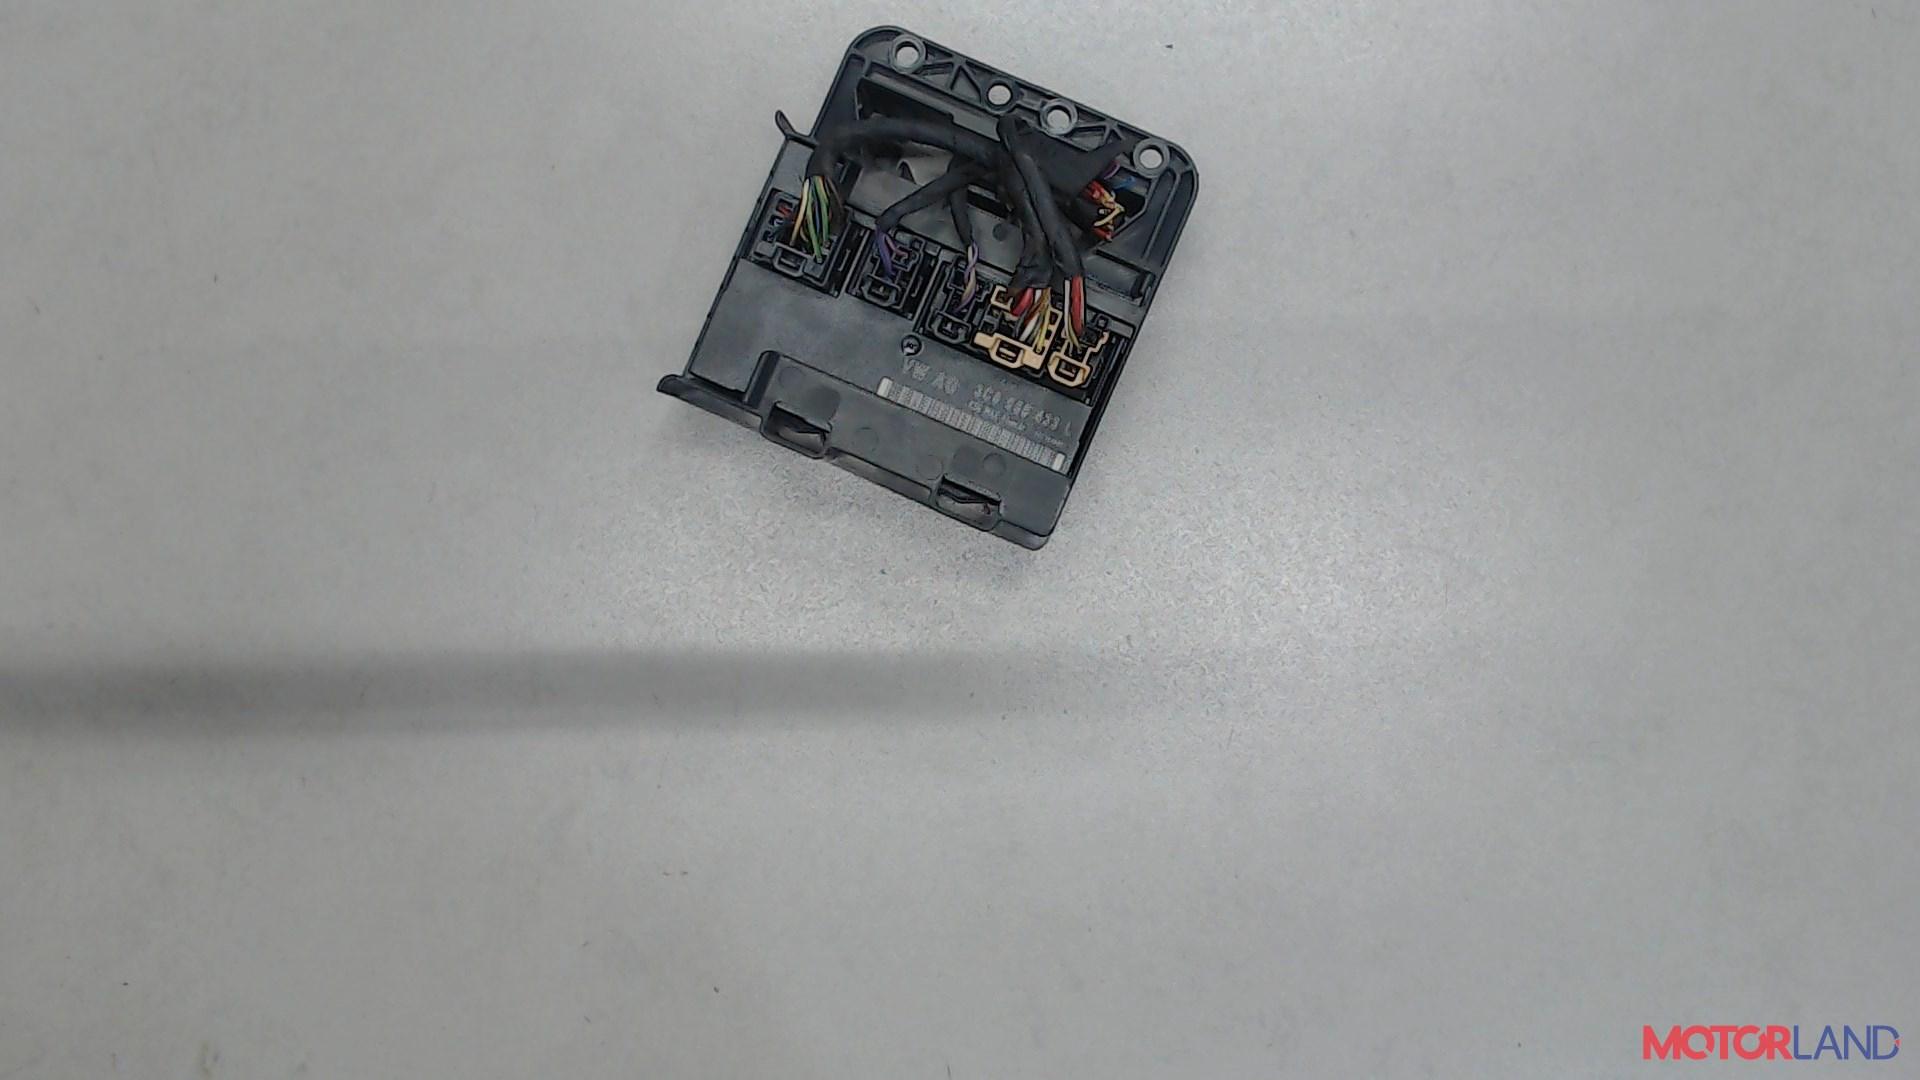 Блок управления (ЭБУ) Volkswagen Passat 6 2005-2010 3.2 л. 2006 AXZ б/у #2